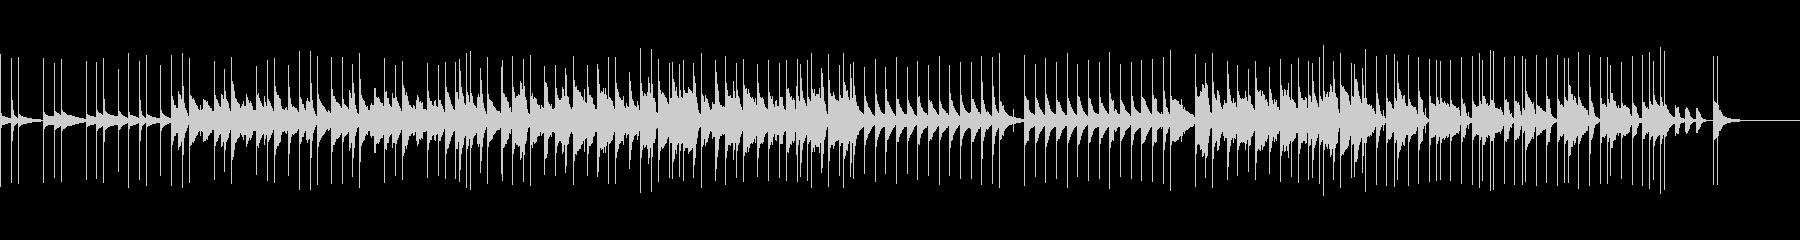 KANTほのぼのワクワクBGMの未再生の波形